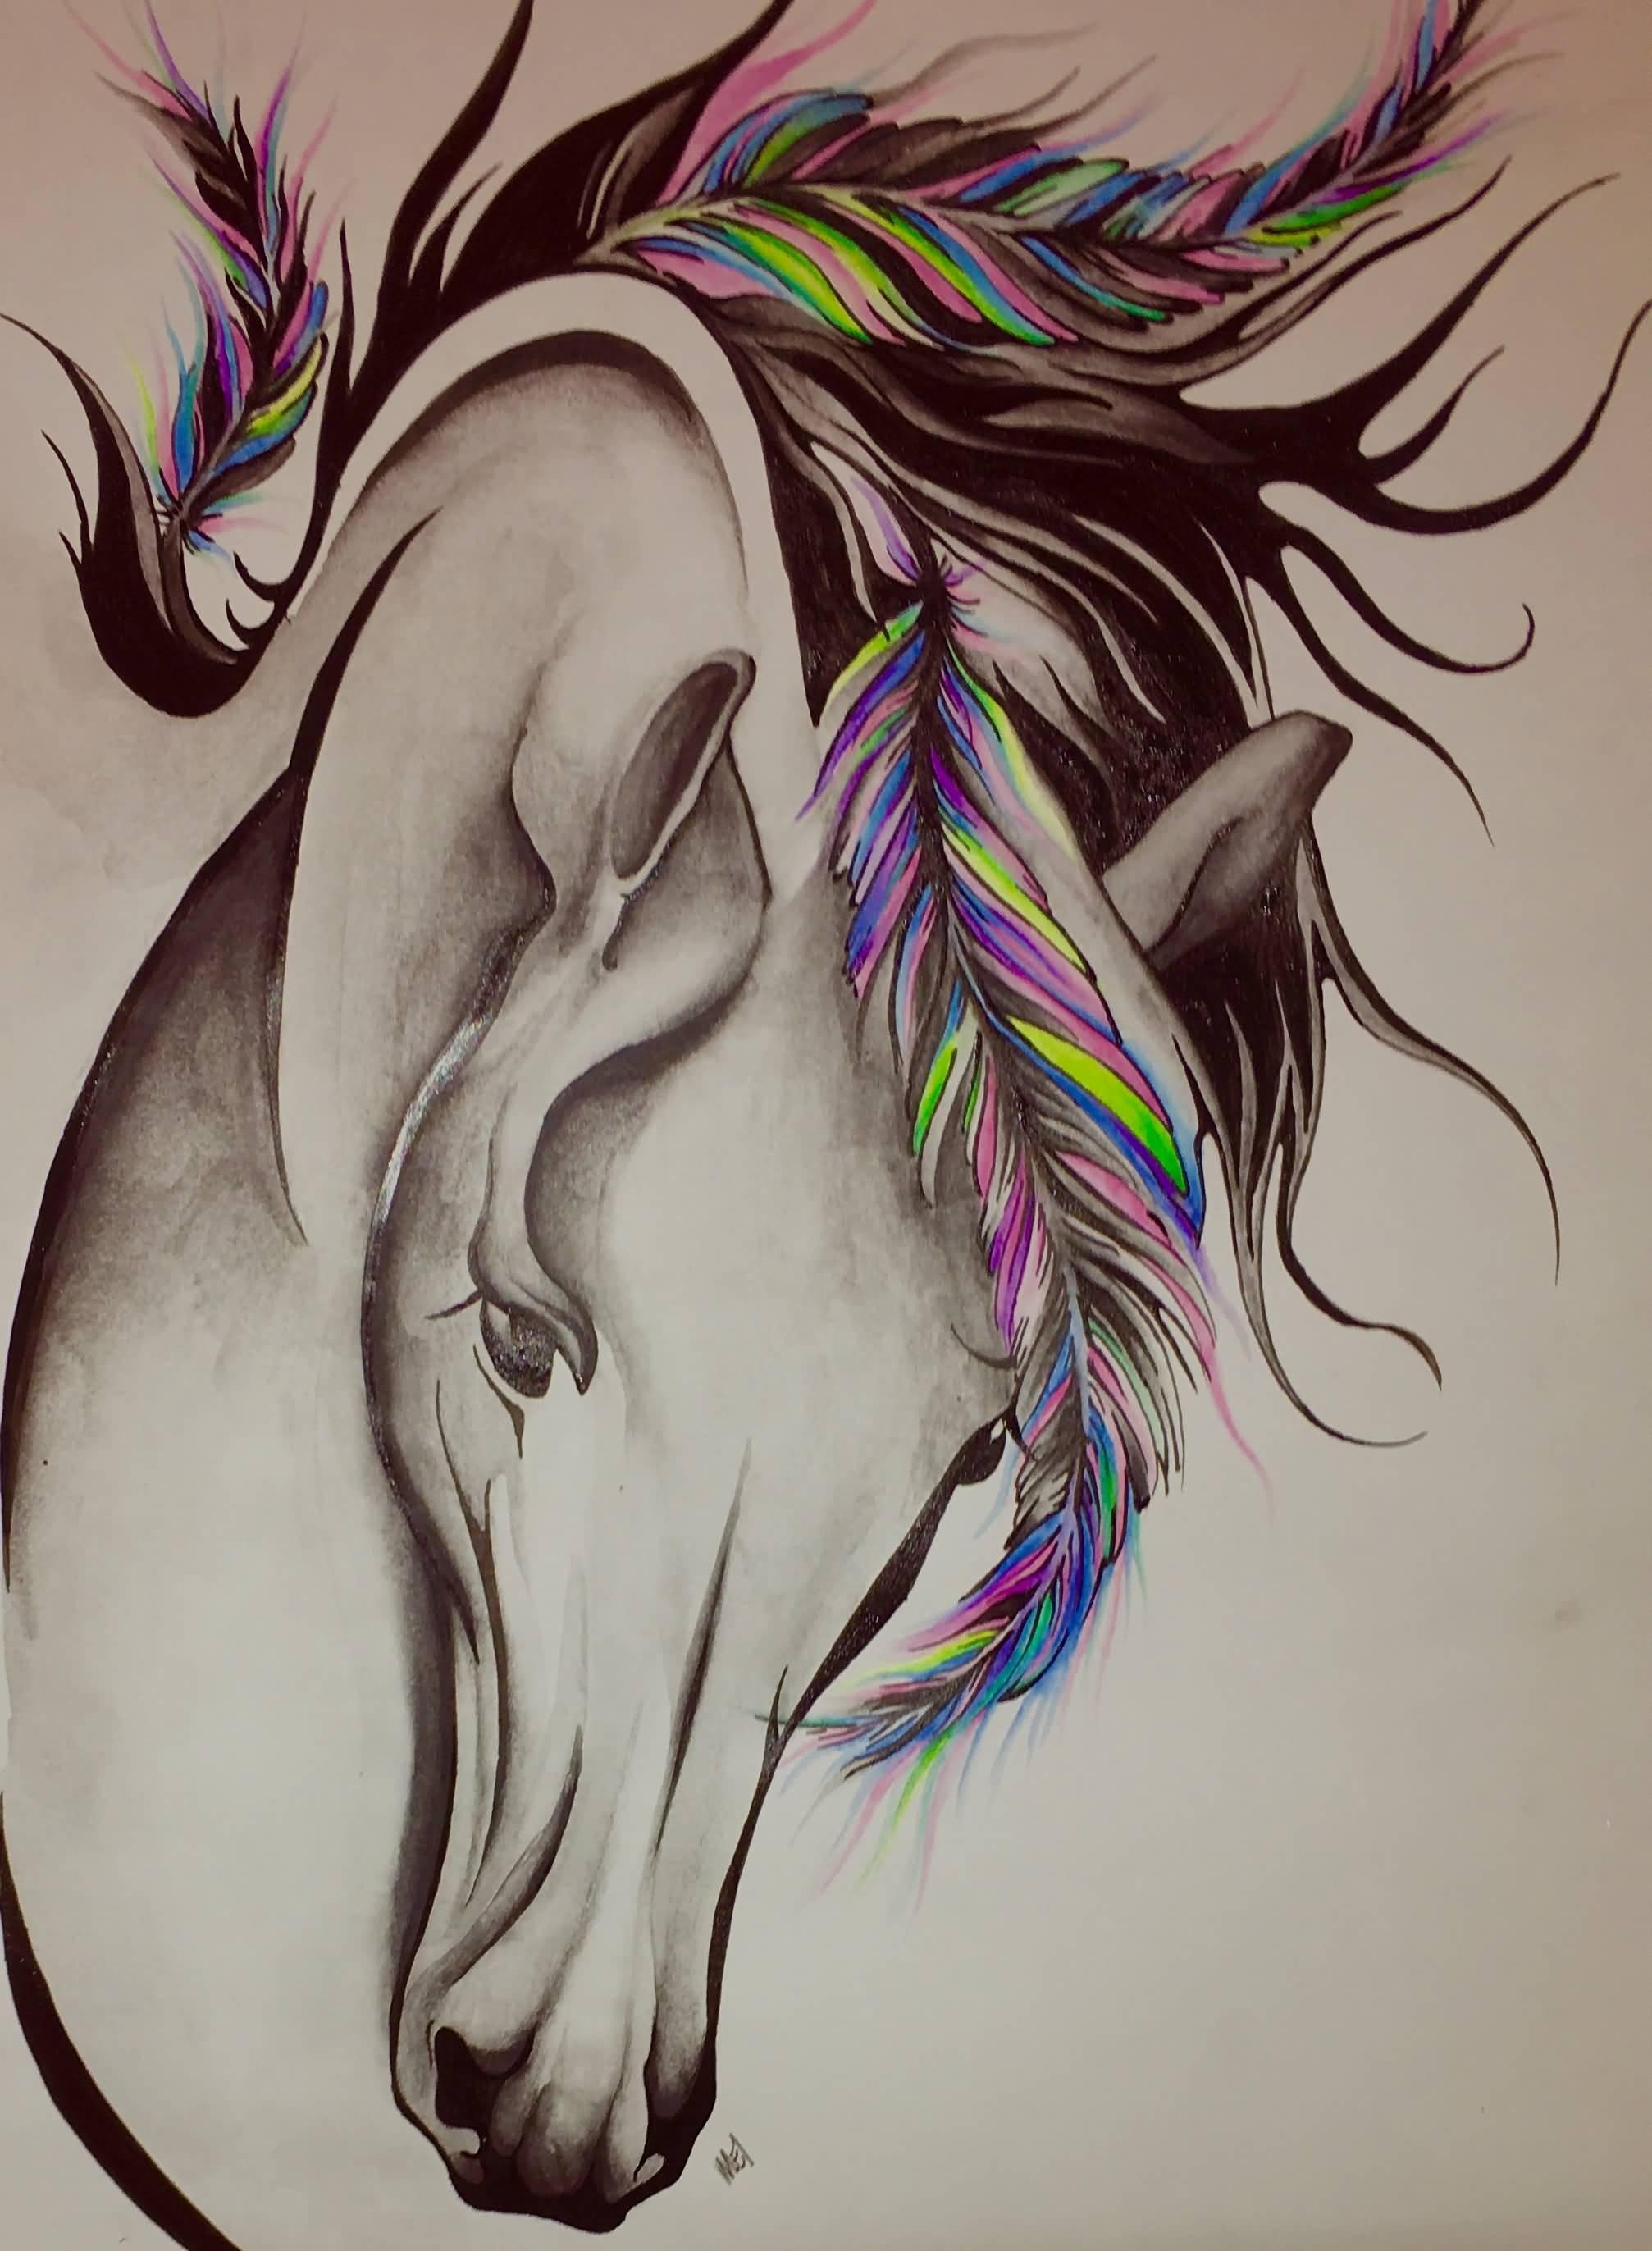 2fad8235eabe9 Colorful Feathers On Horse Head Tattoo Design